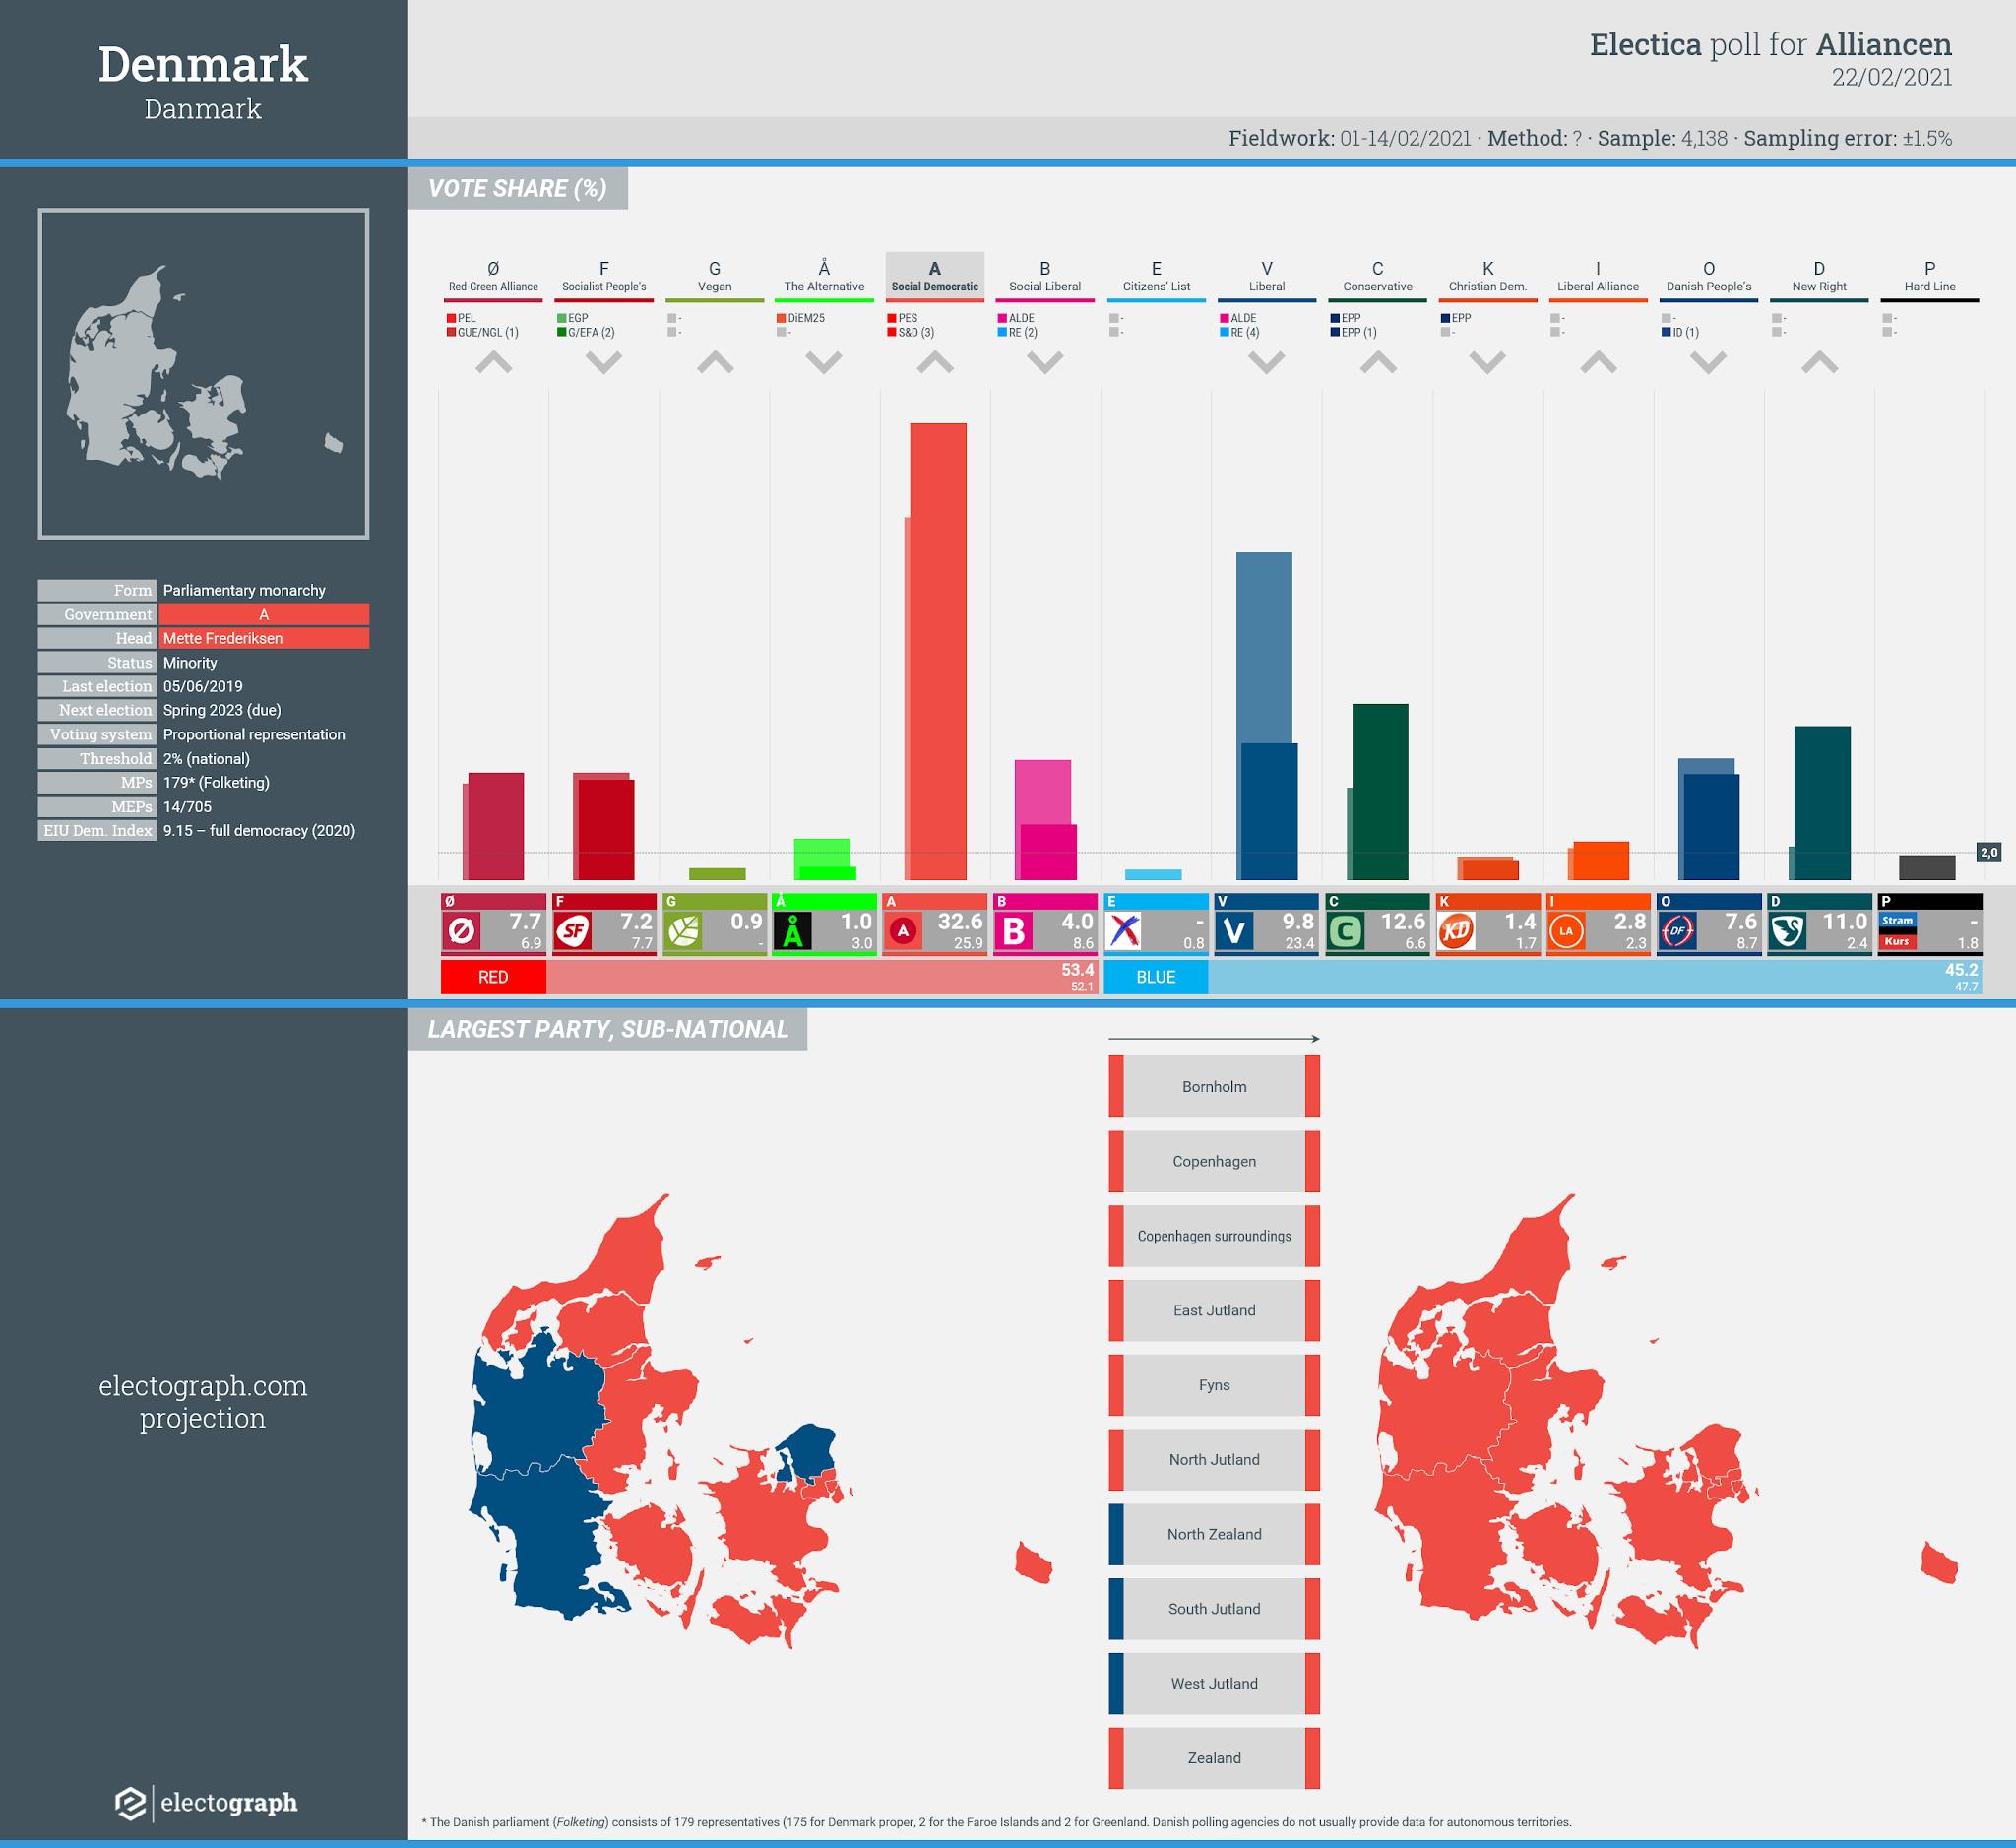 DENMARK: Electica poll chart for Alliancen, 22 February 2021